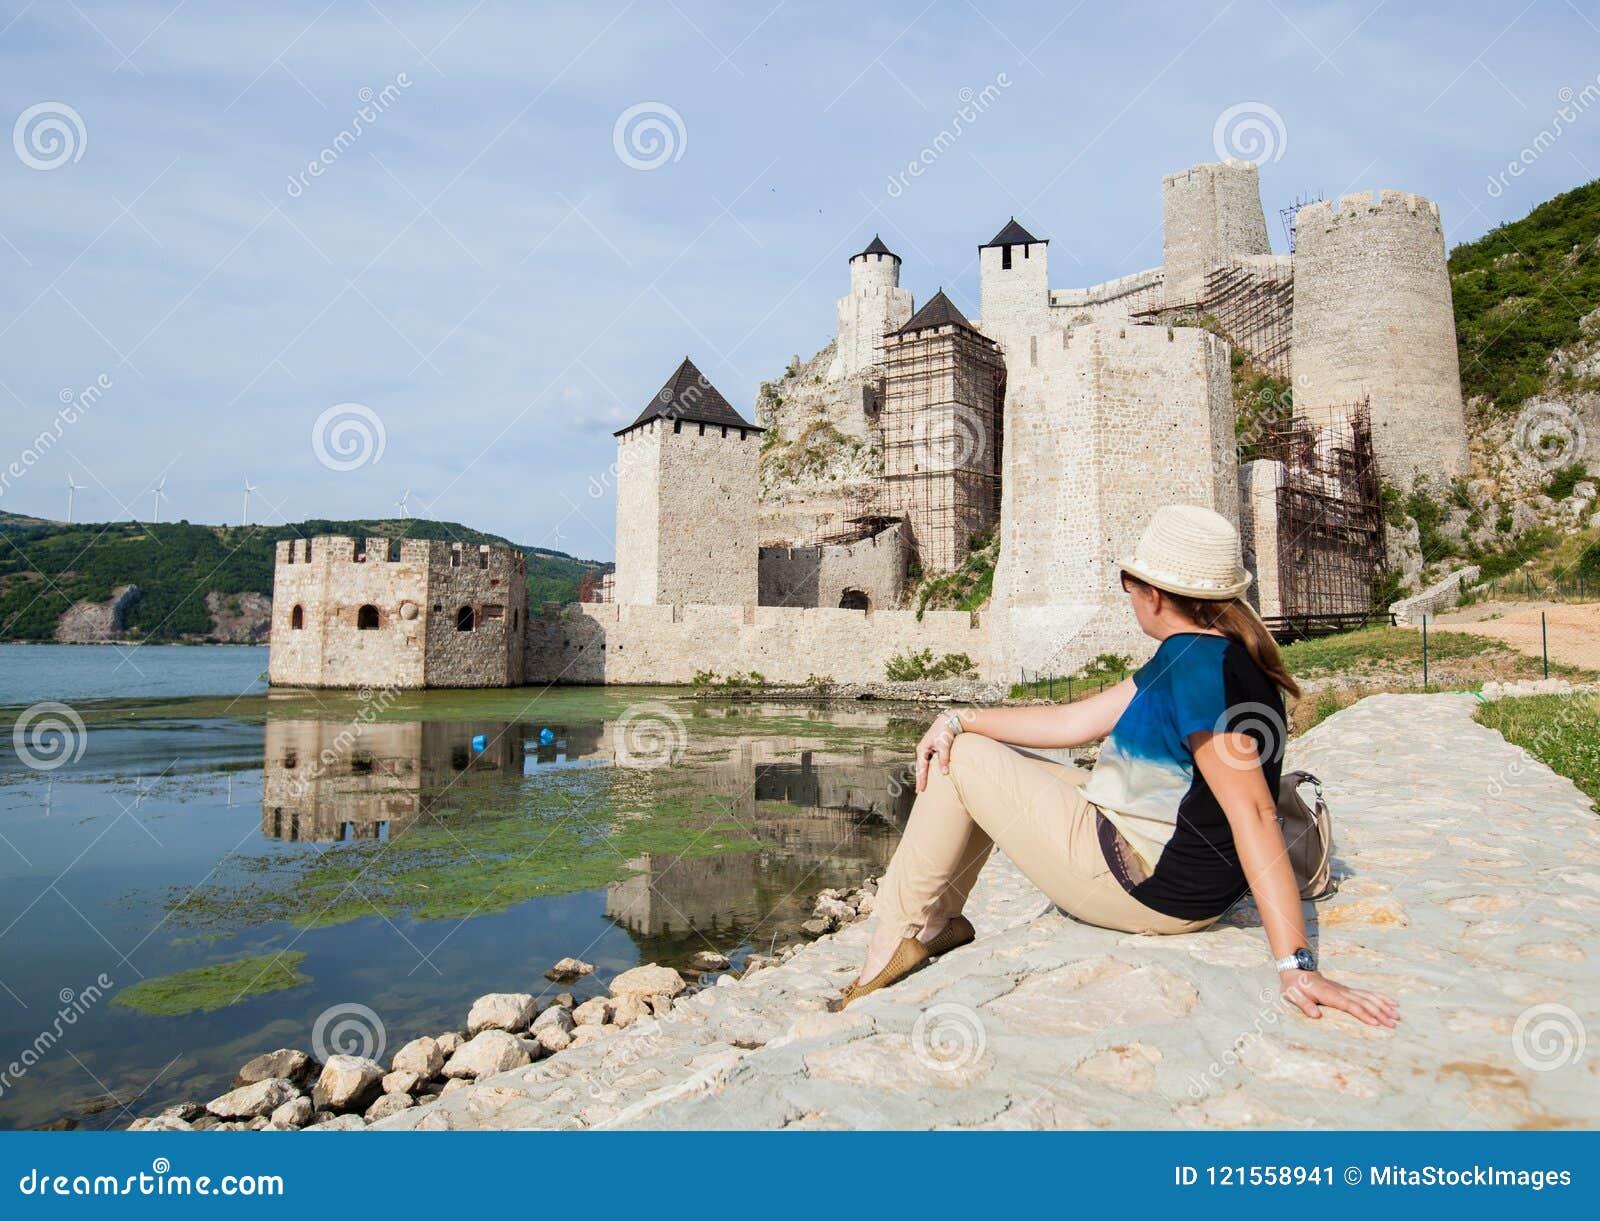 Travel Destination Serbia Woman Tourist Stock Image Image Of Danube Architecture 121558941